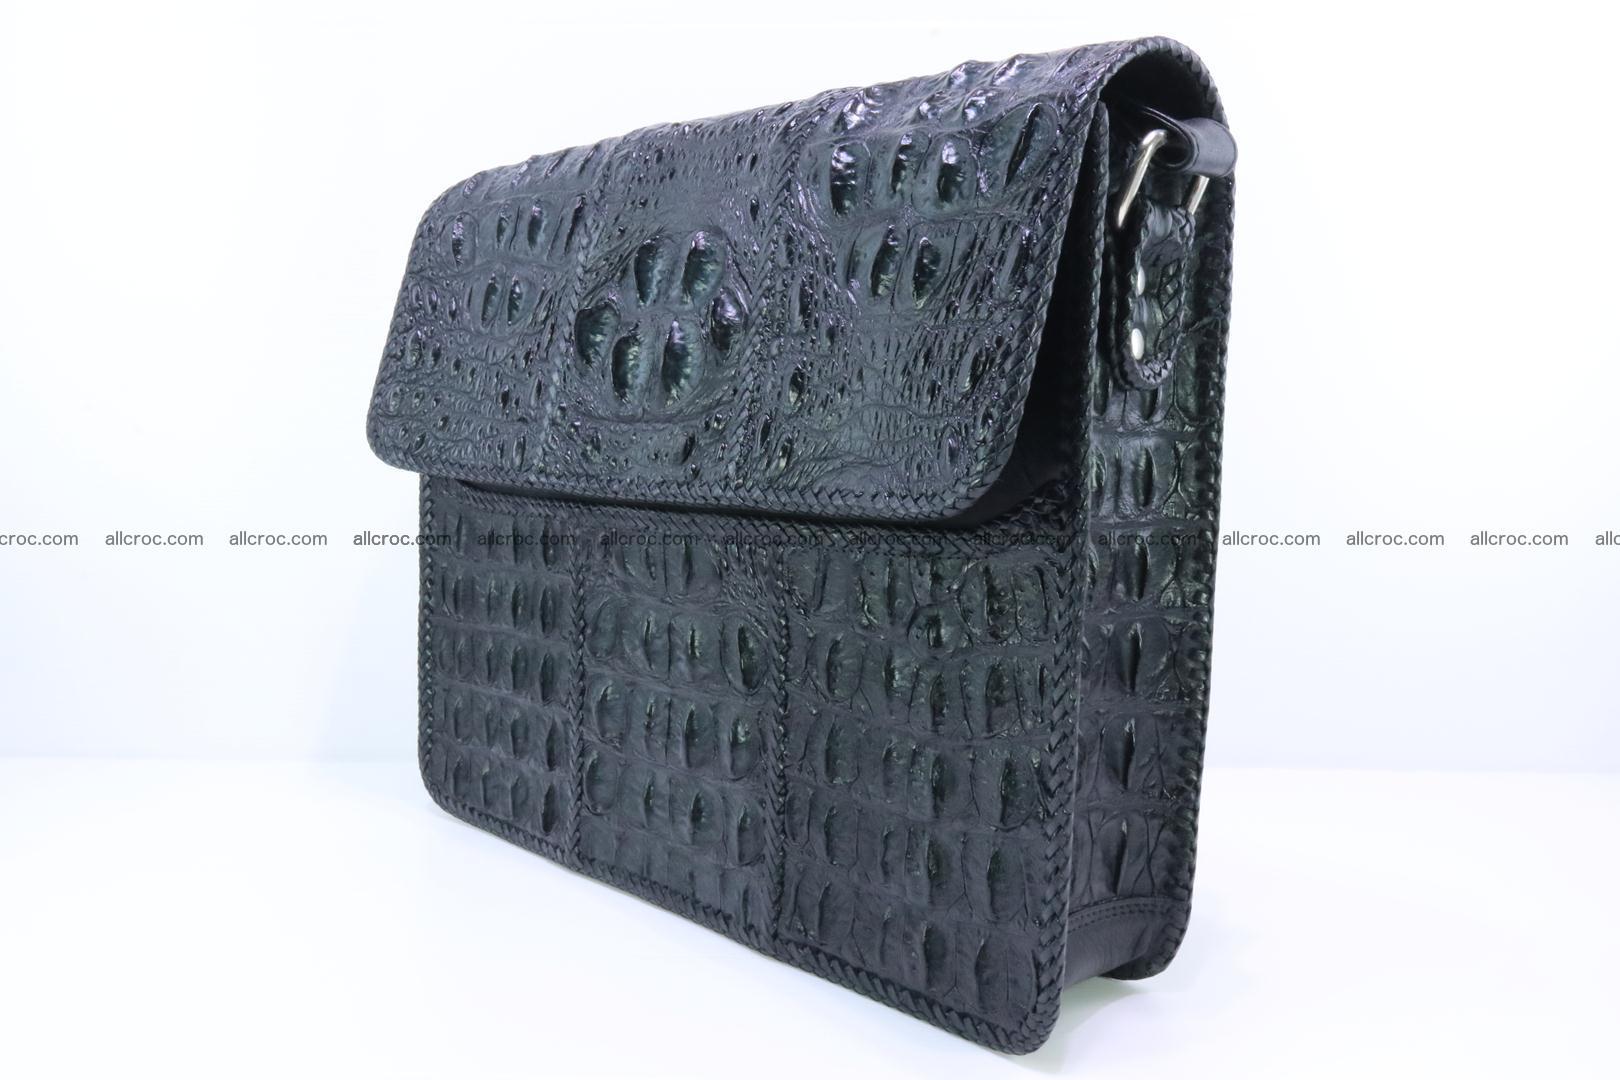 Crocodile skin shoulder bag with braided edges 147 Foto 3